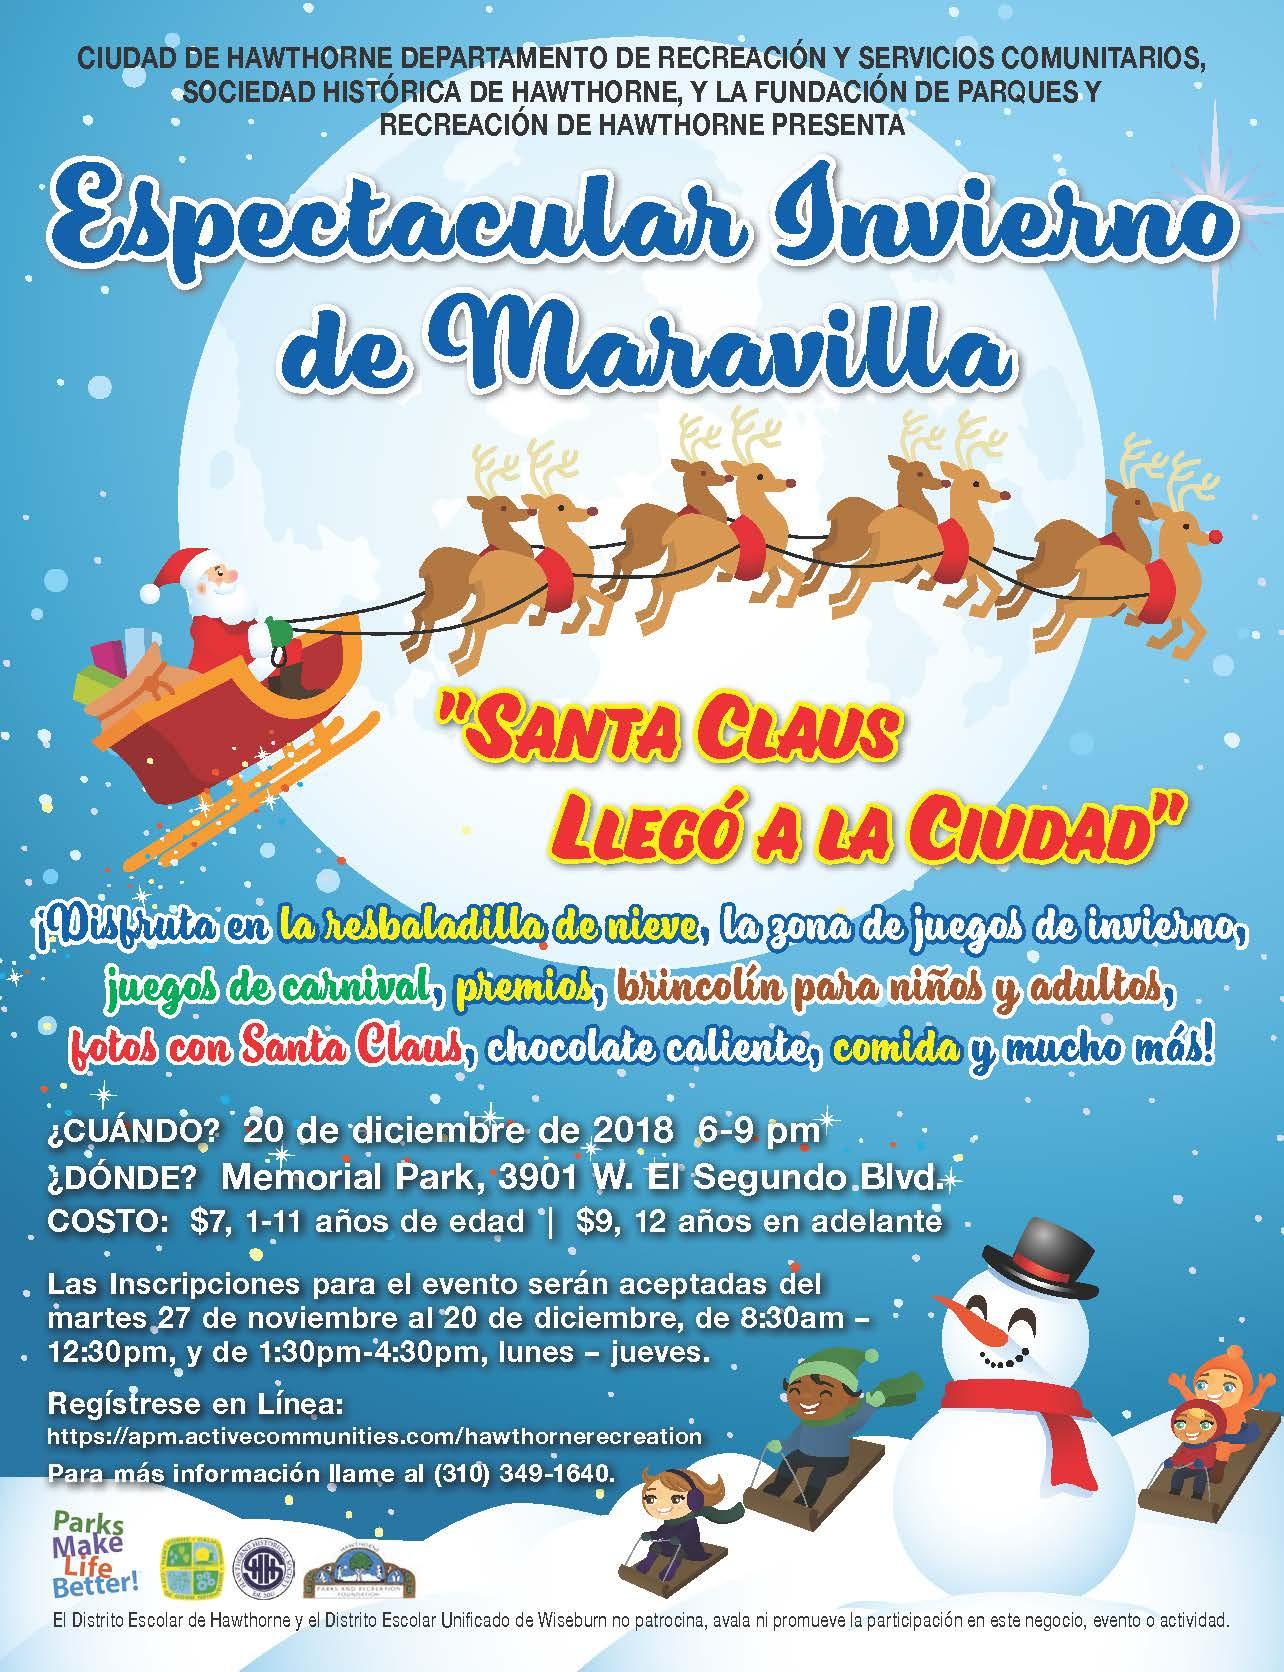 Winter Wonderland Spectacular - Spanish